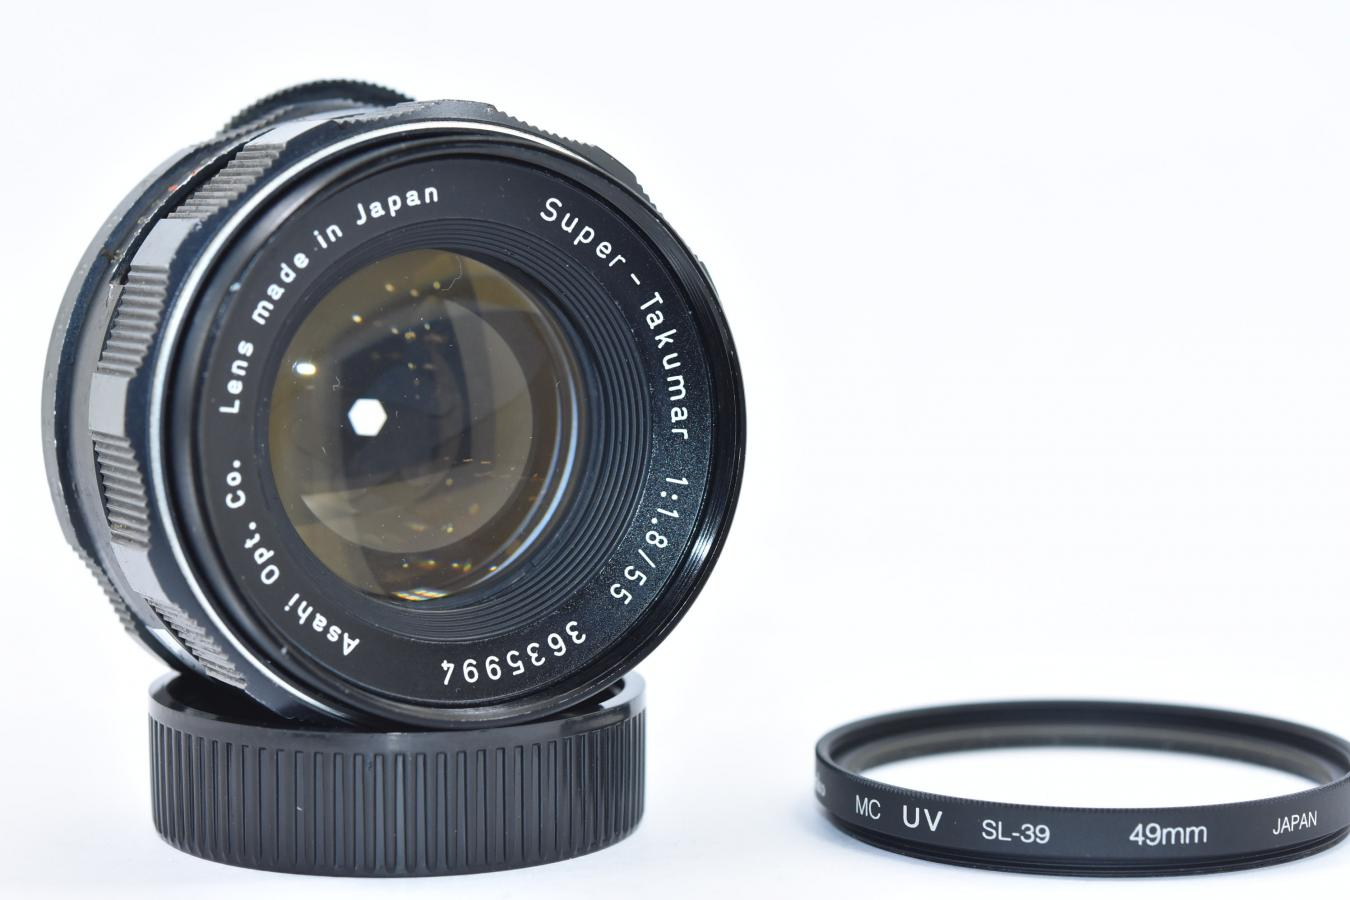 PENTAX Super-Takumar 55mm F1.8 ケンコー製49mmMC UVフィルター付 【カメラ女子に絶大な人気のオールドレンズ M42マウントレンズ】